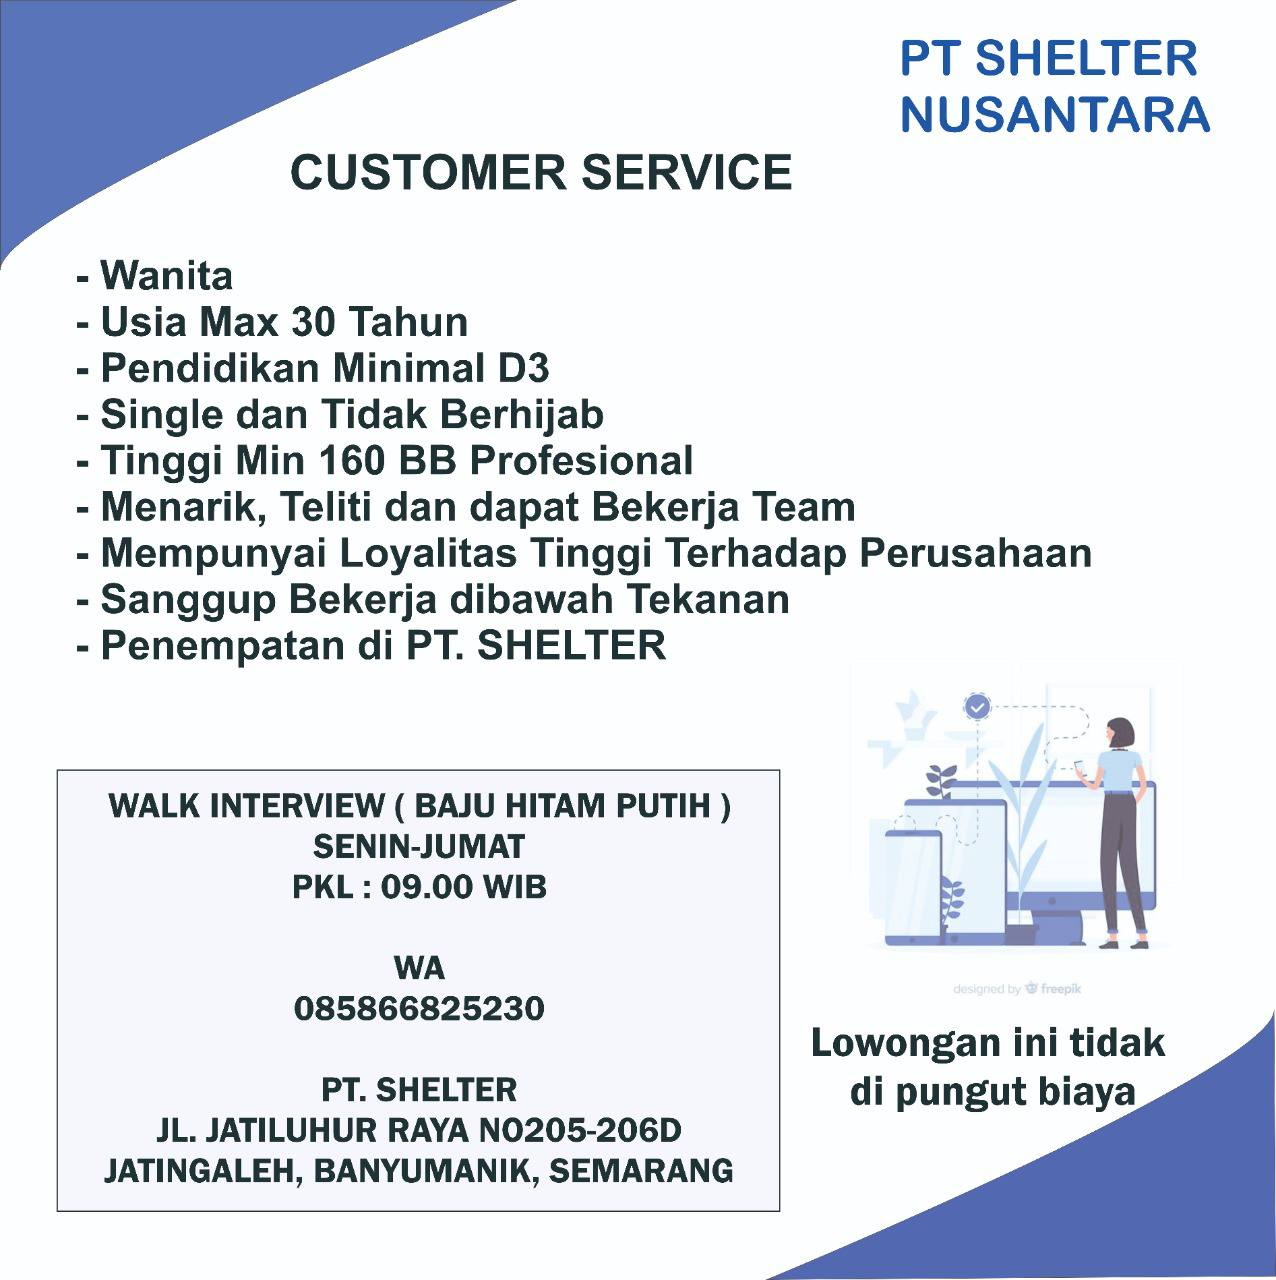 Dibuka kembali Lowongan Kerja PT Shelter Nusantara Semarang